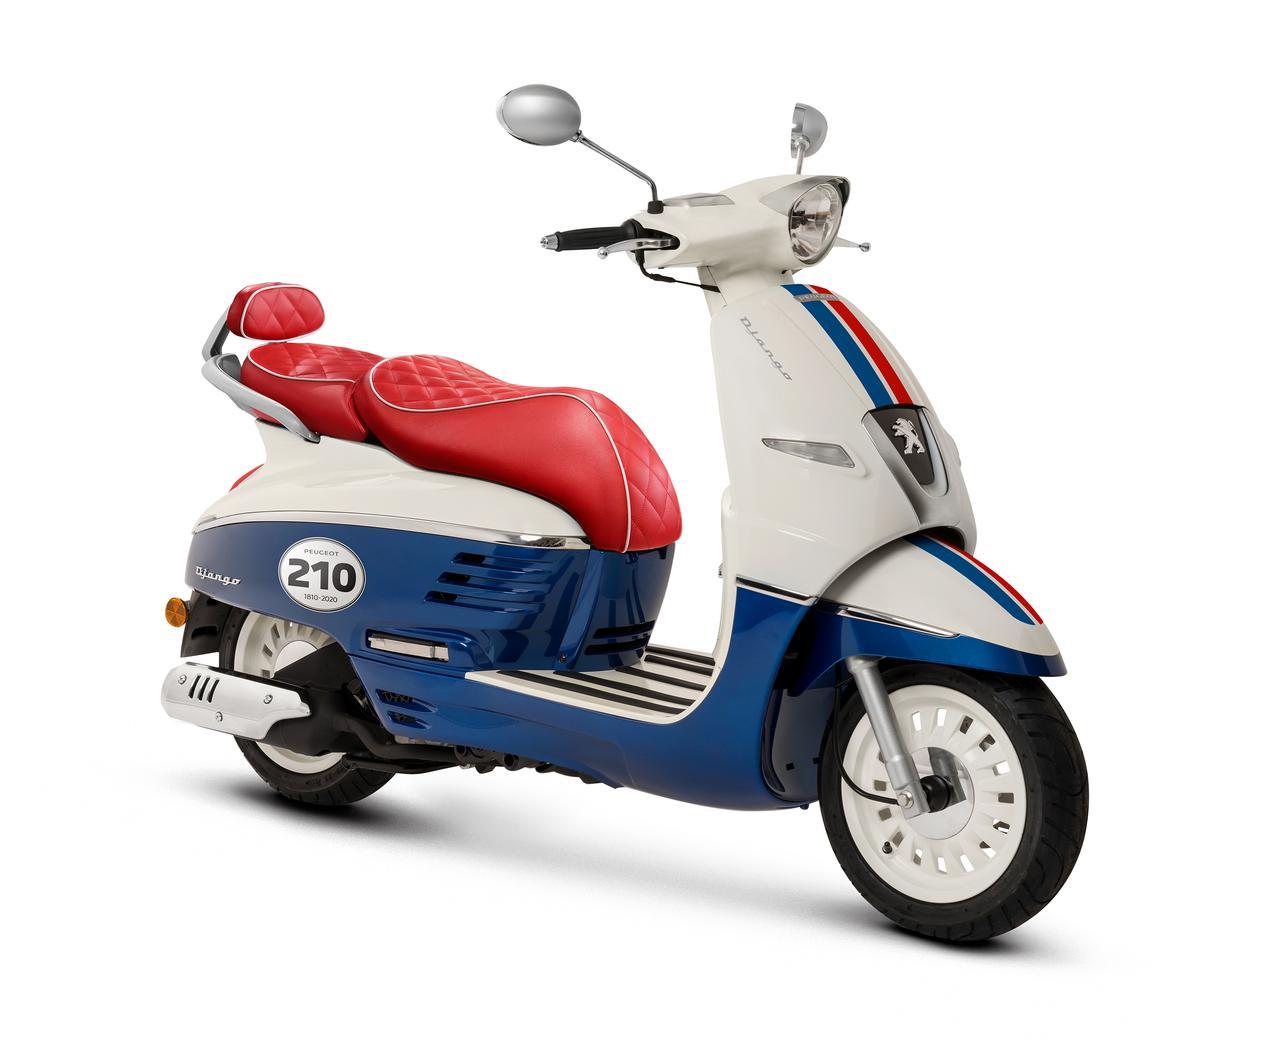 Images : 13番目の画像 - 「ジャンゴ 125 ABS 210周年リミテッドエディション」の写真を見る - LAWRENCE - Motorcycle x Cars + α = Your Life.